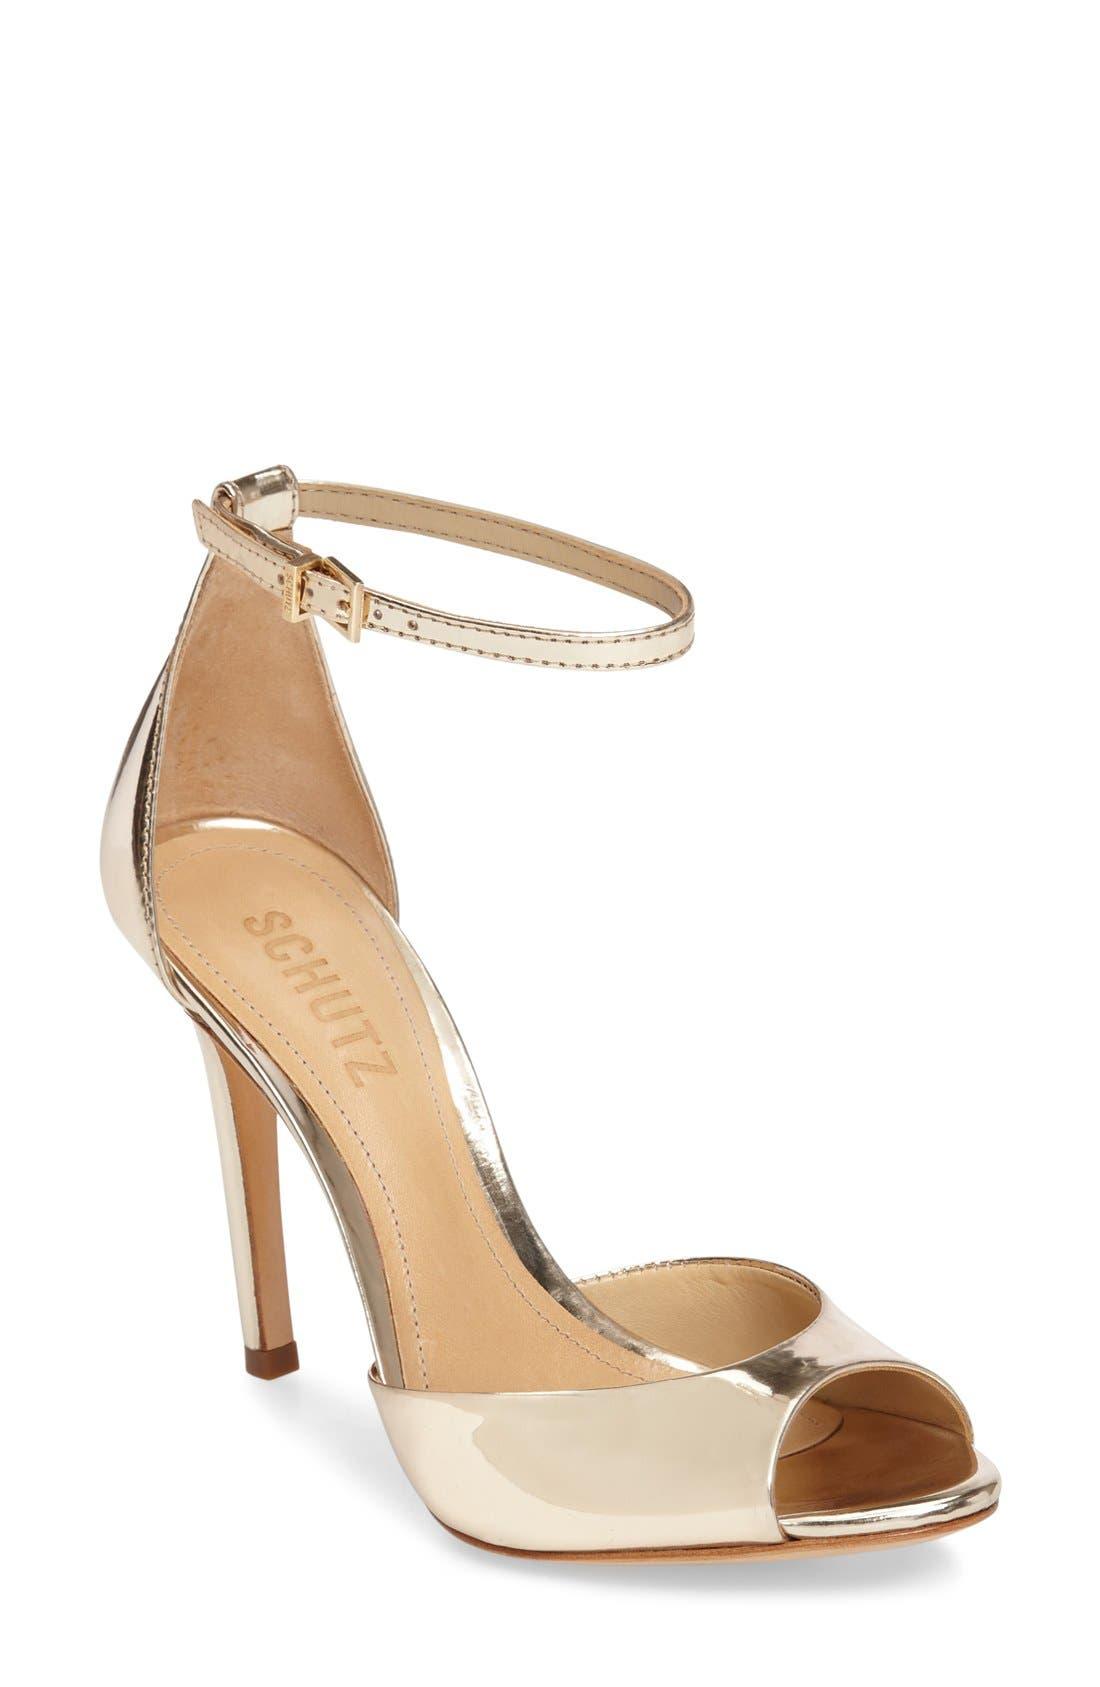 5799a7601bd Women s Schutz Shoes